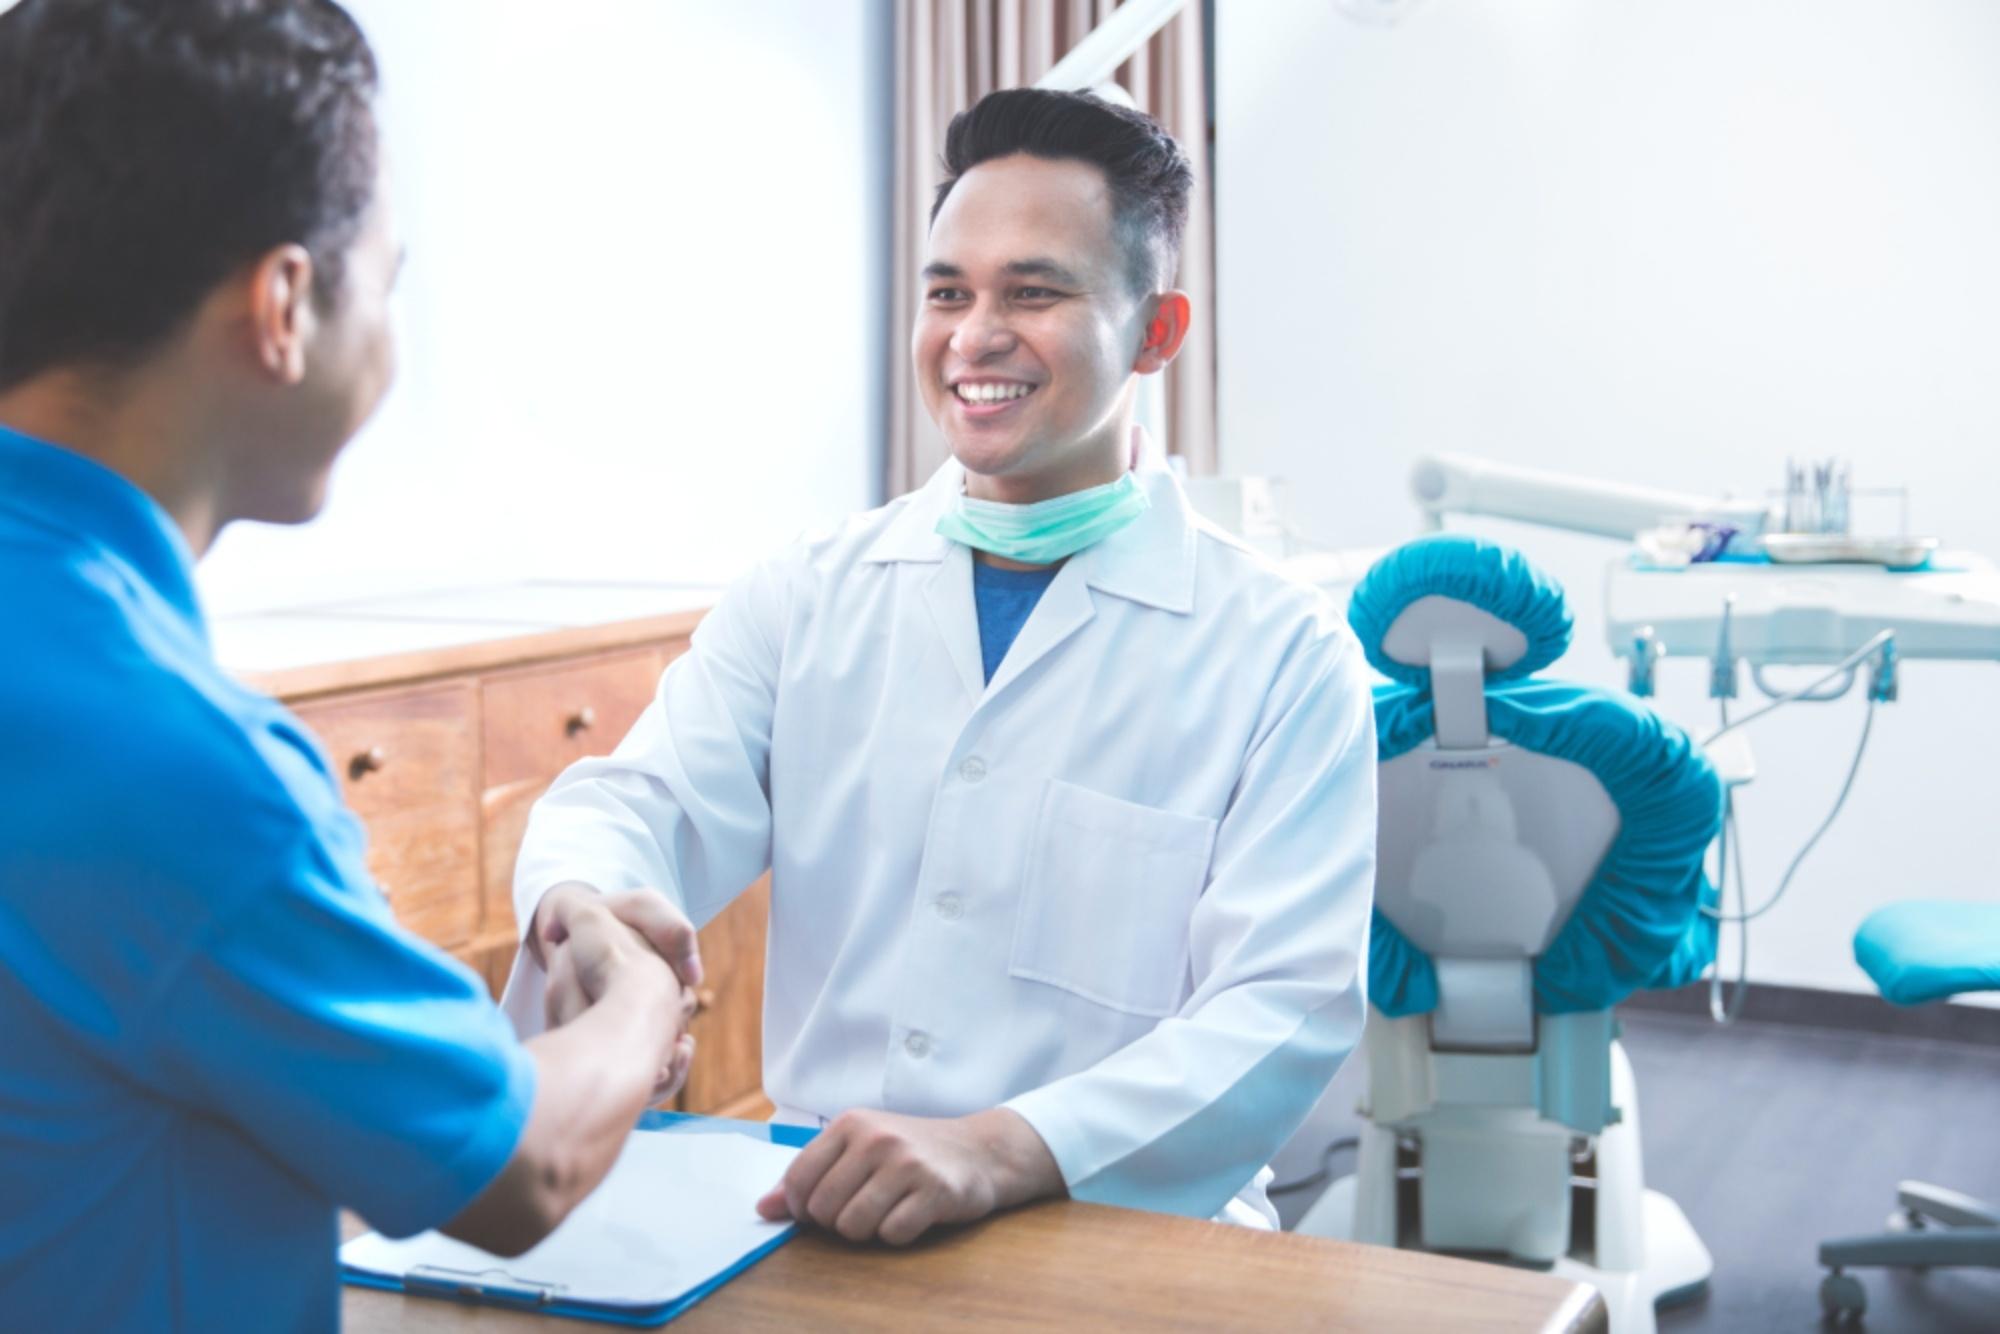 dentist professional liability insurance